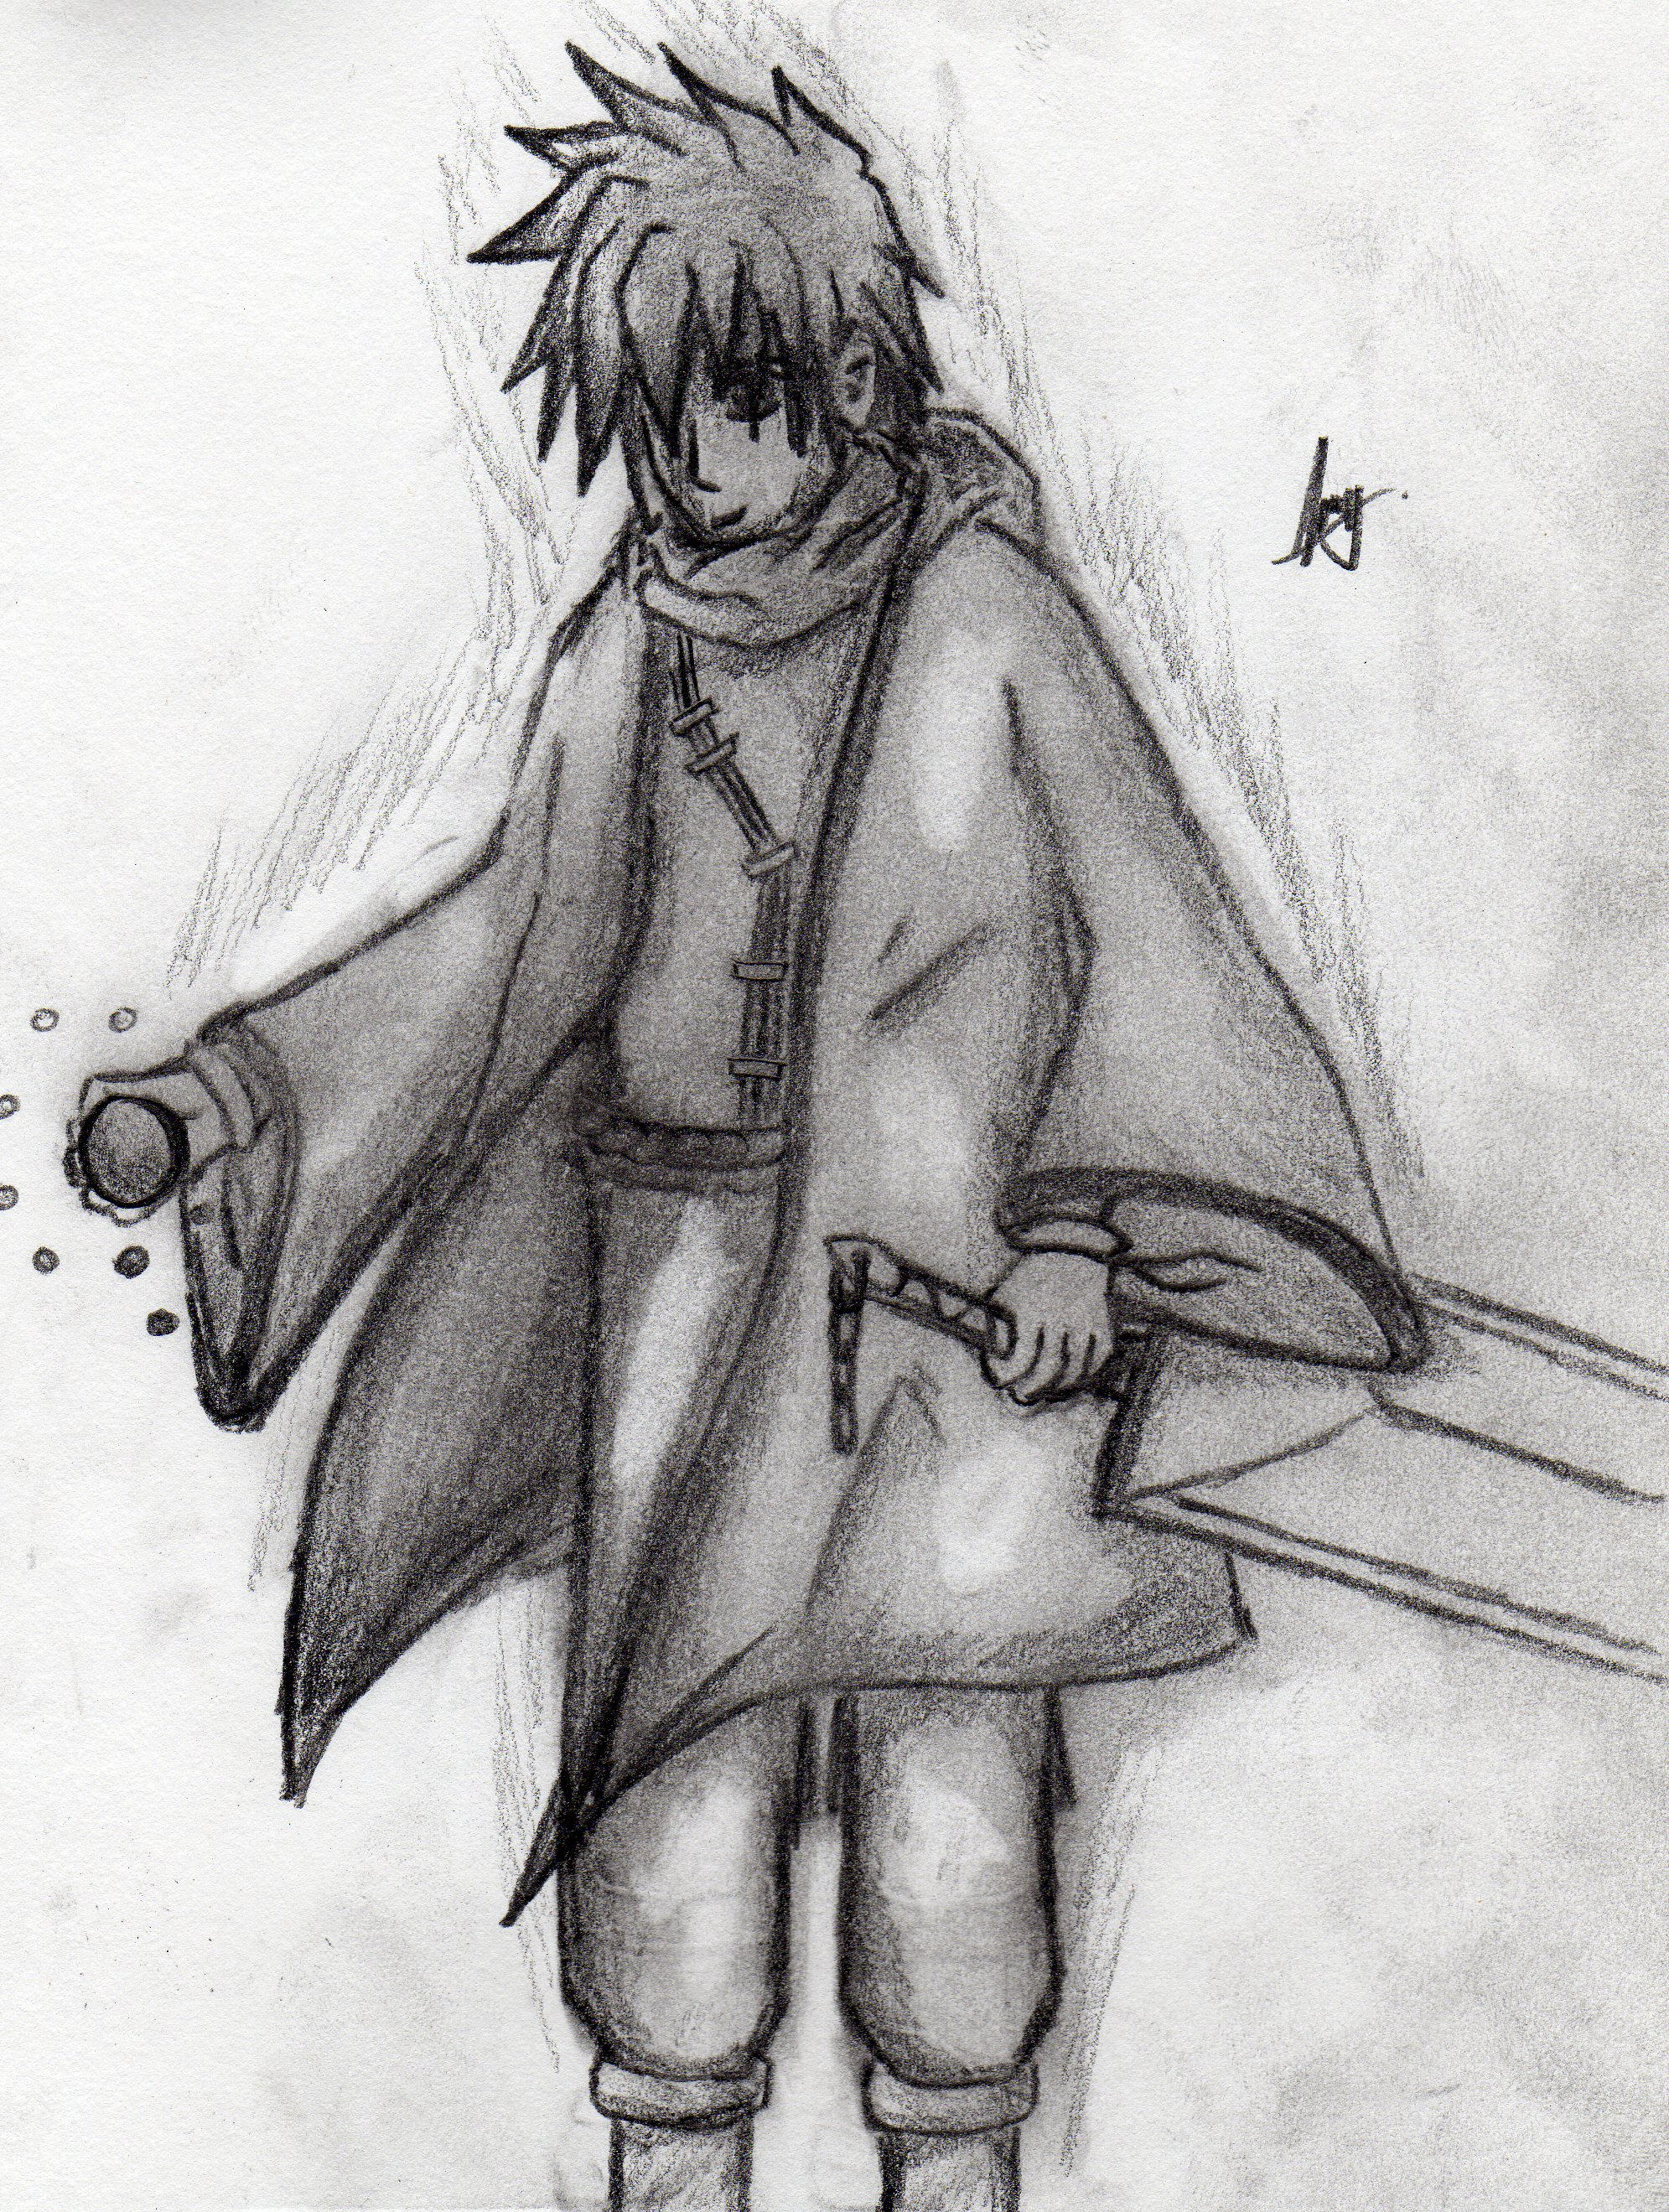 Hooded Warrior Anime | www.imgkid.com - The Image Kid Has It!